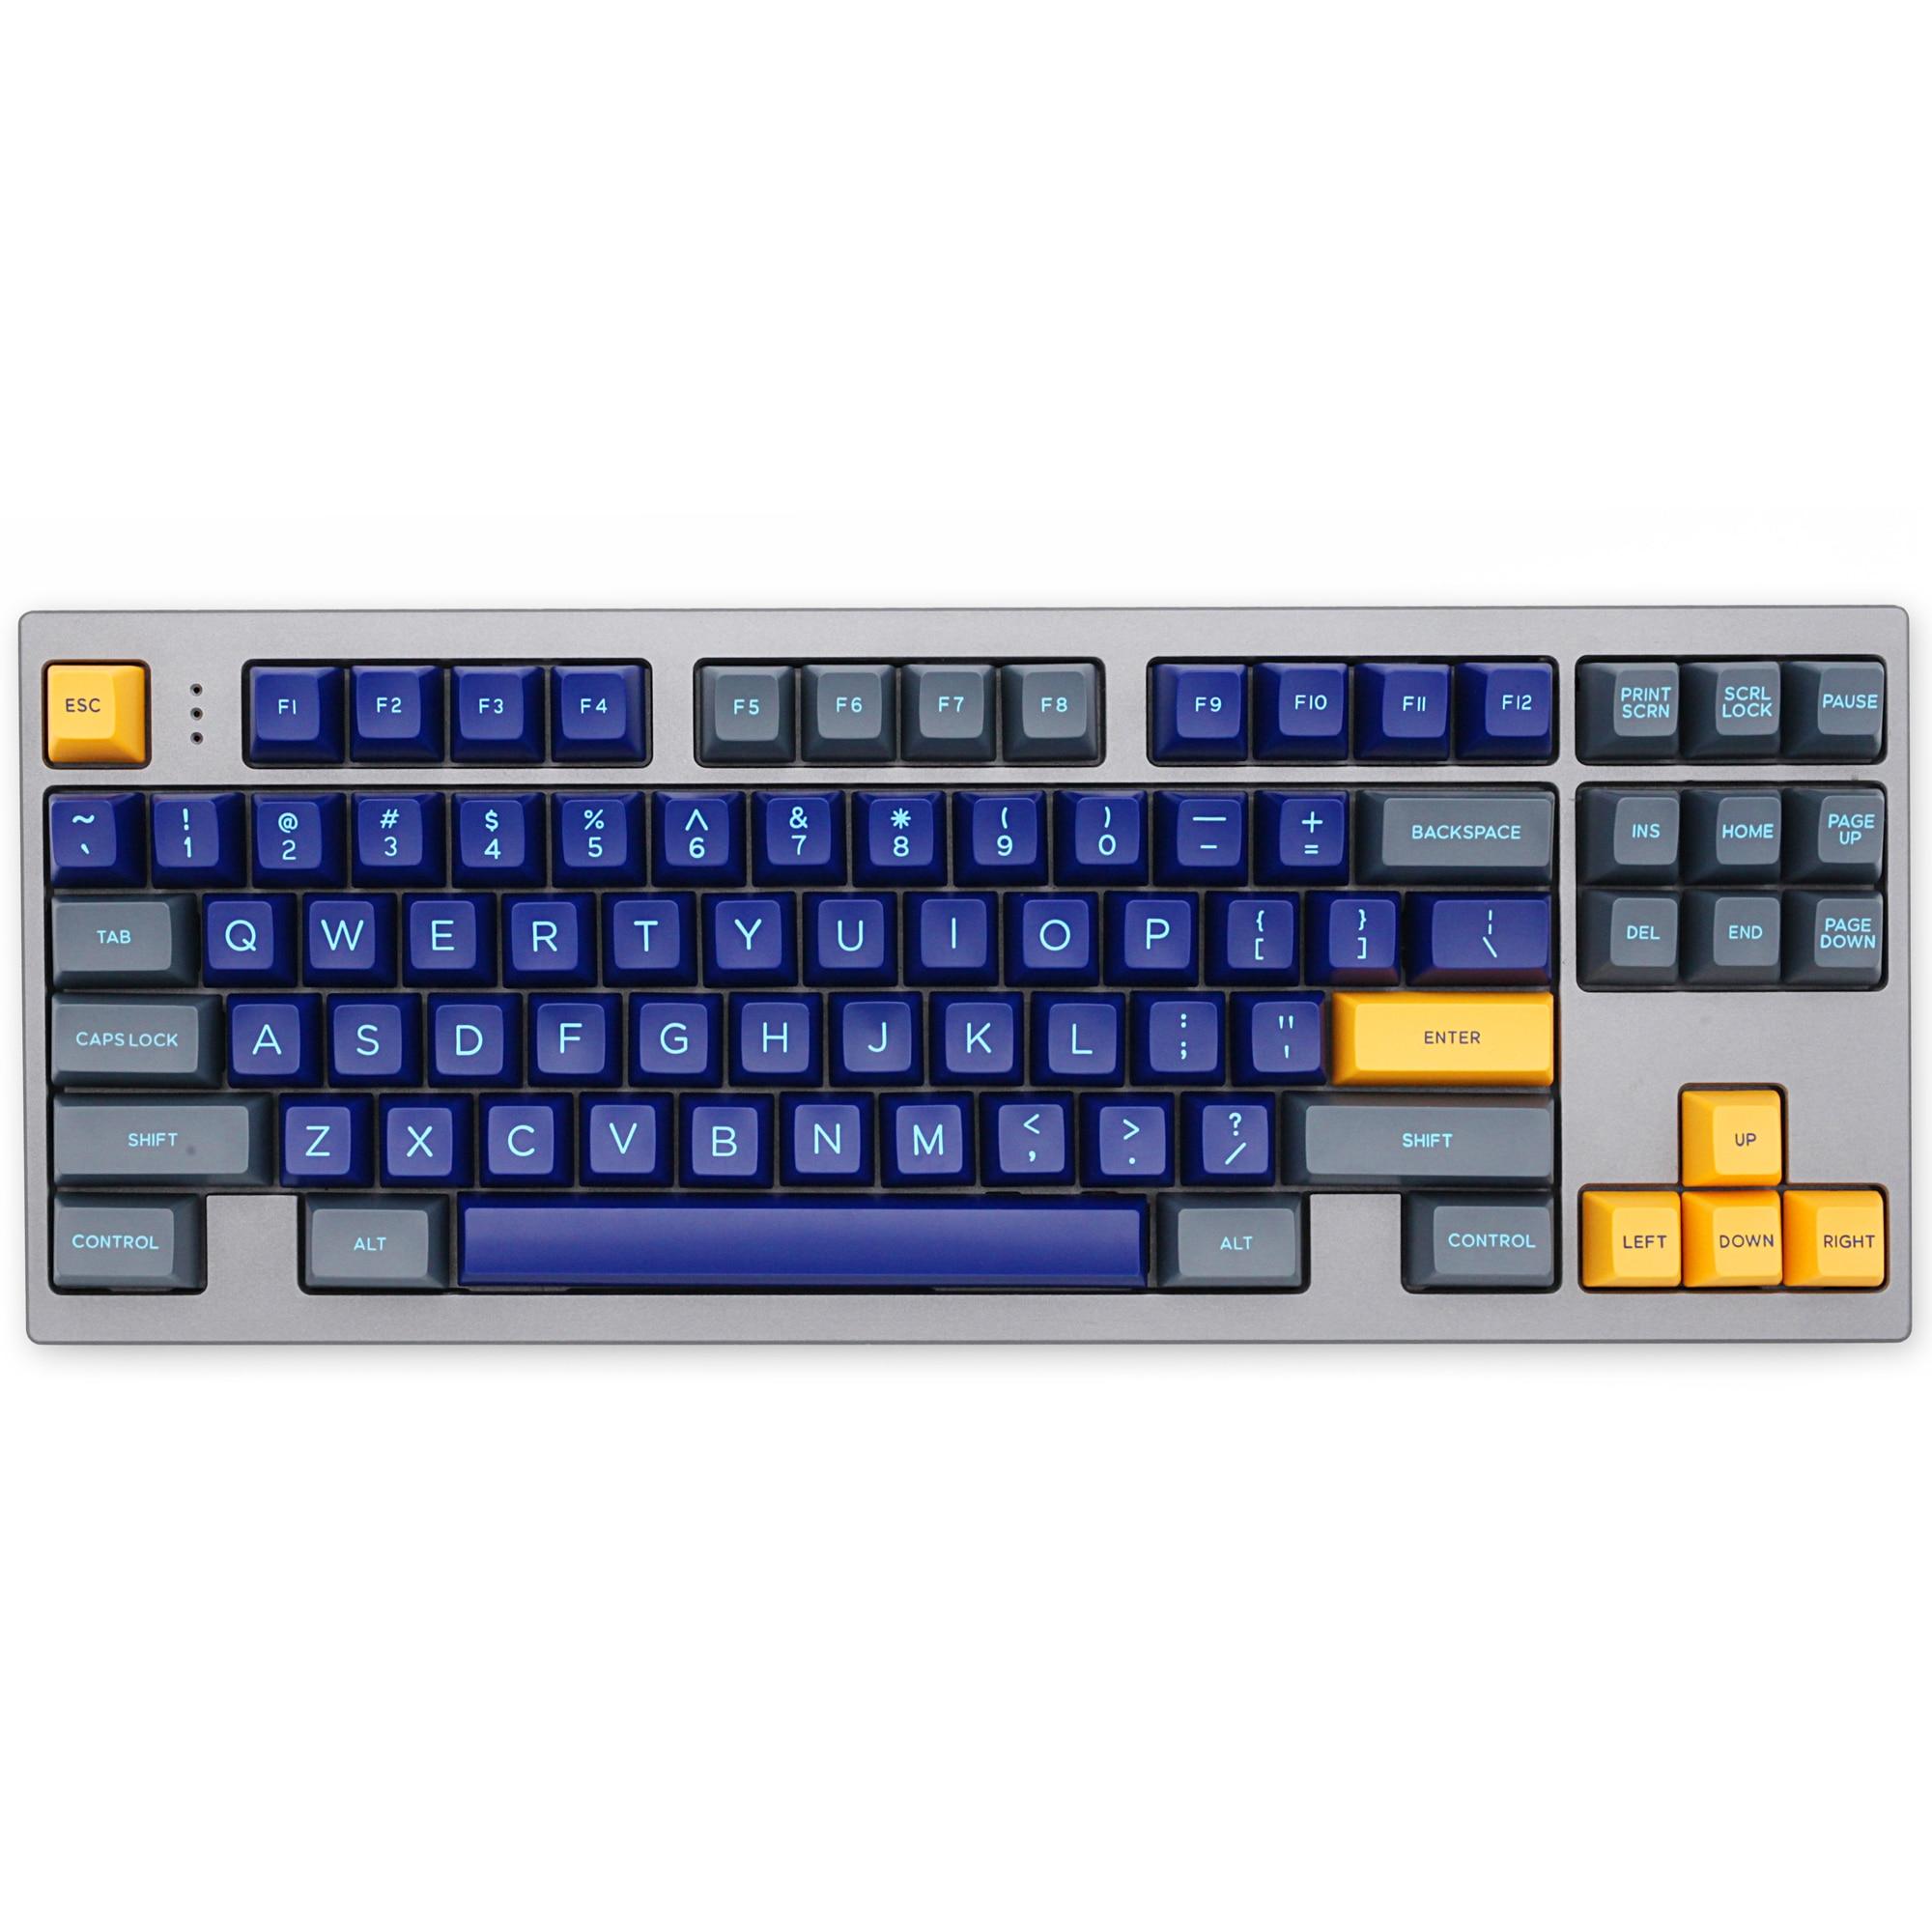 Domikey SA abs doubleshot klavye tuş takımı seti atlantis SA profil mx kök klavye poker 87 104 gh60 xd64 xd68 xd84 xd96 xd75 xd87